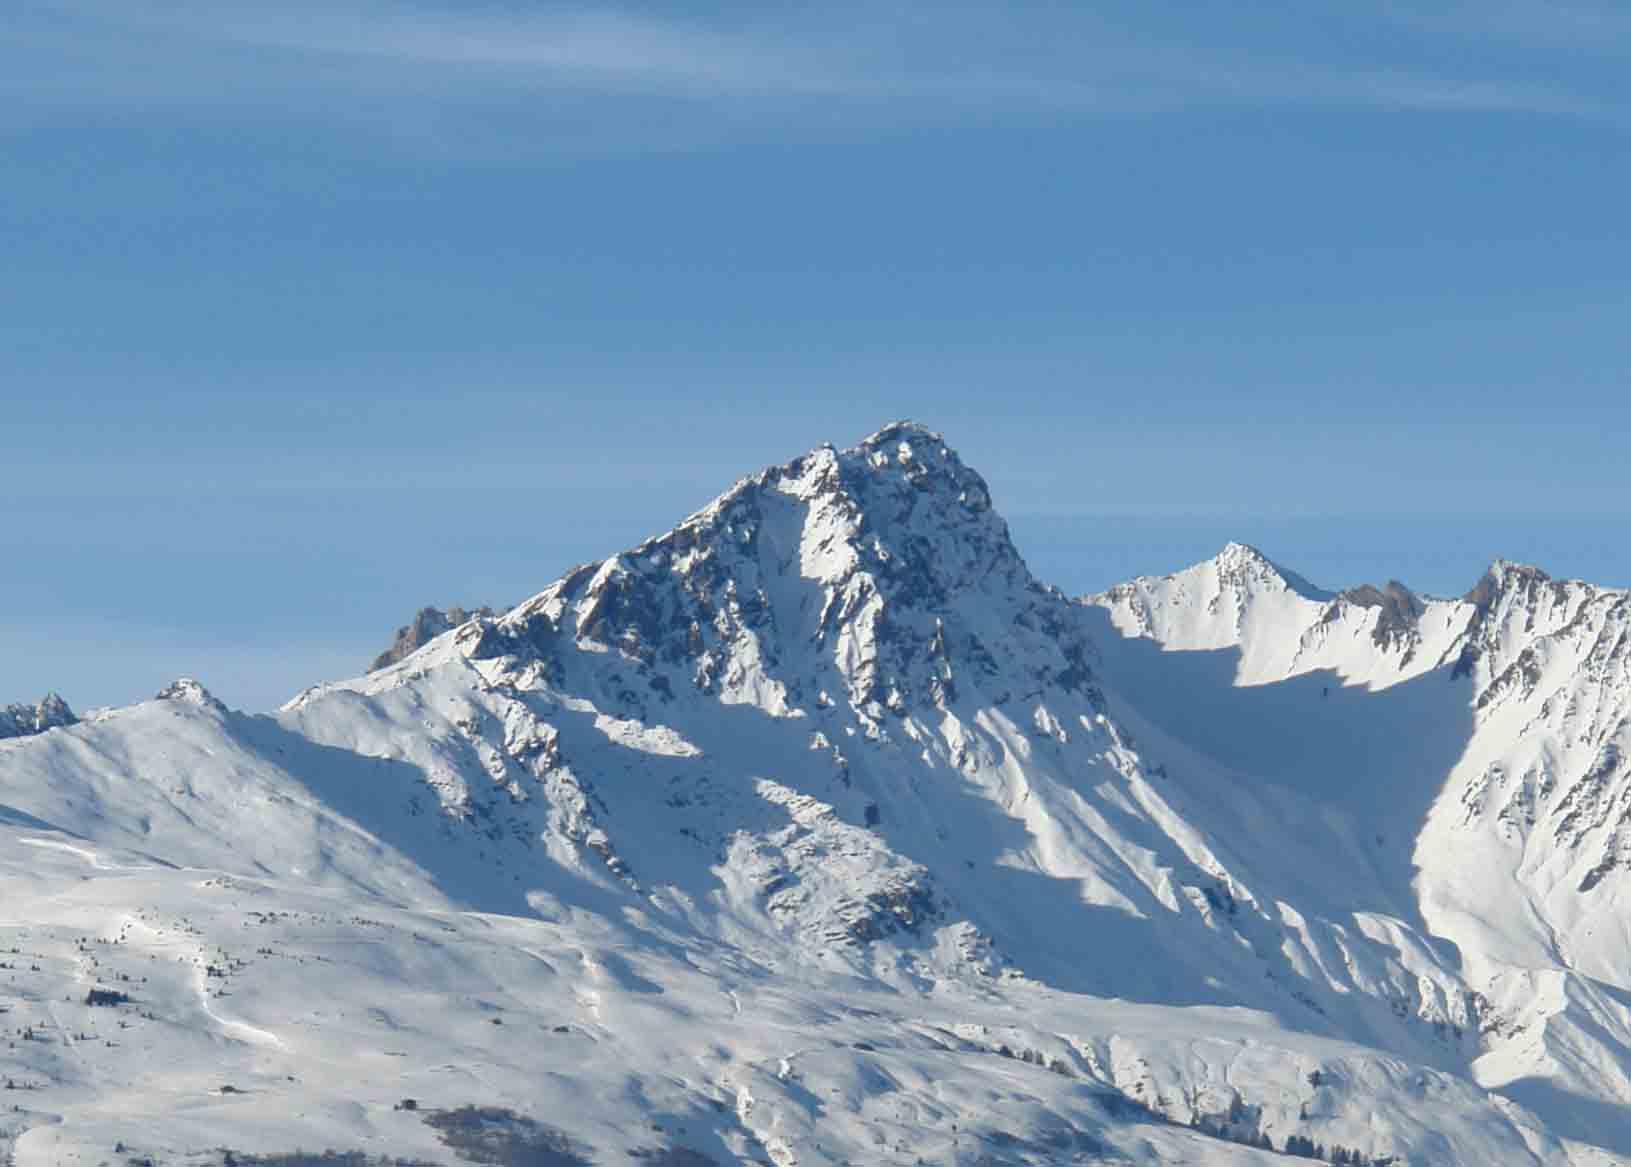 snowy-mountain-range-small.jpg